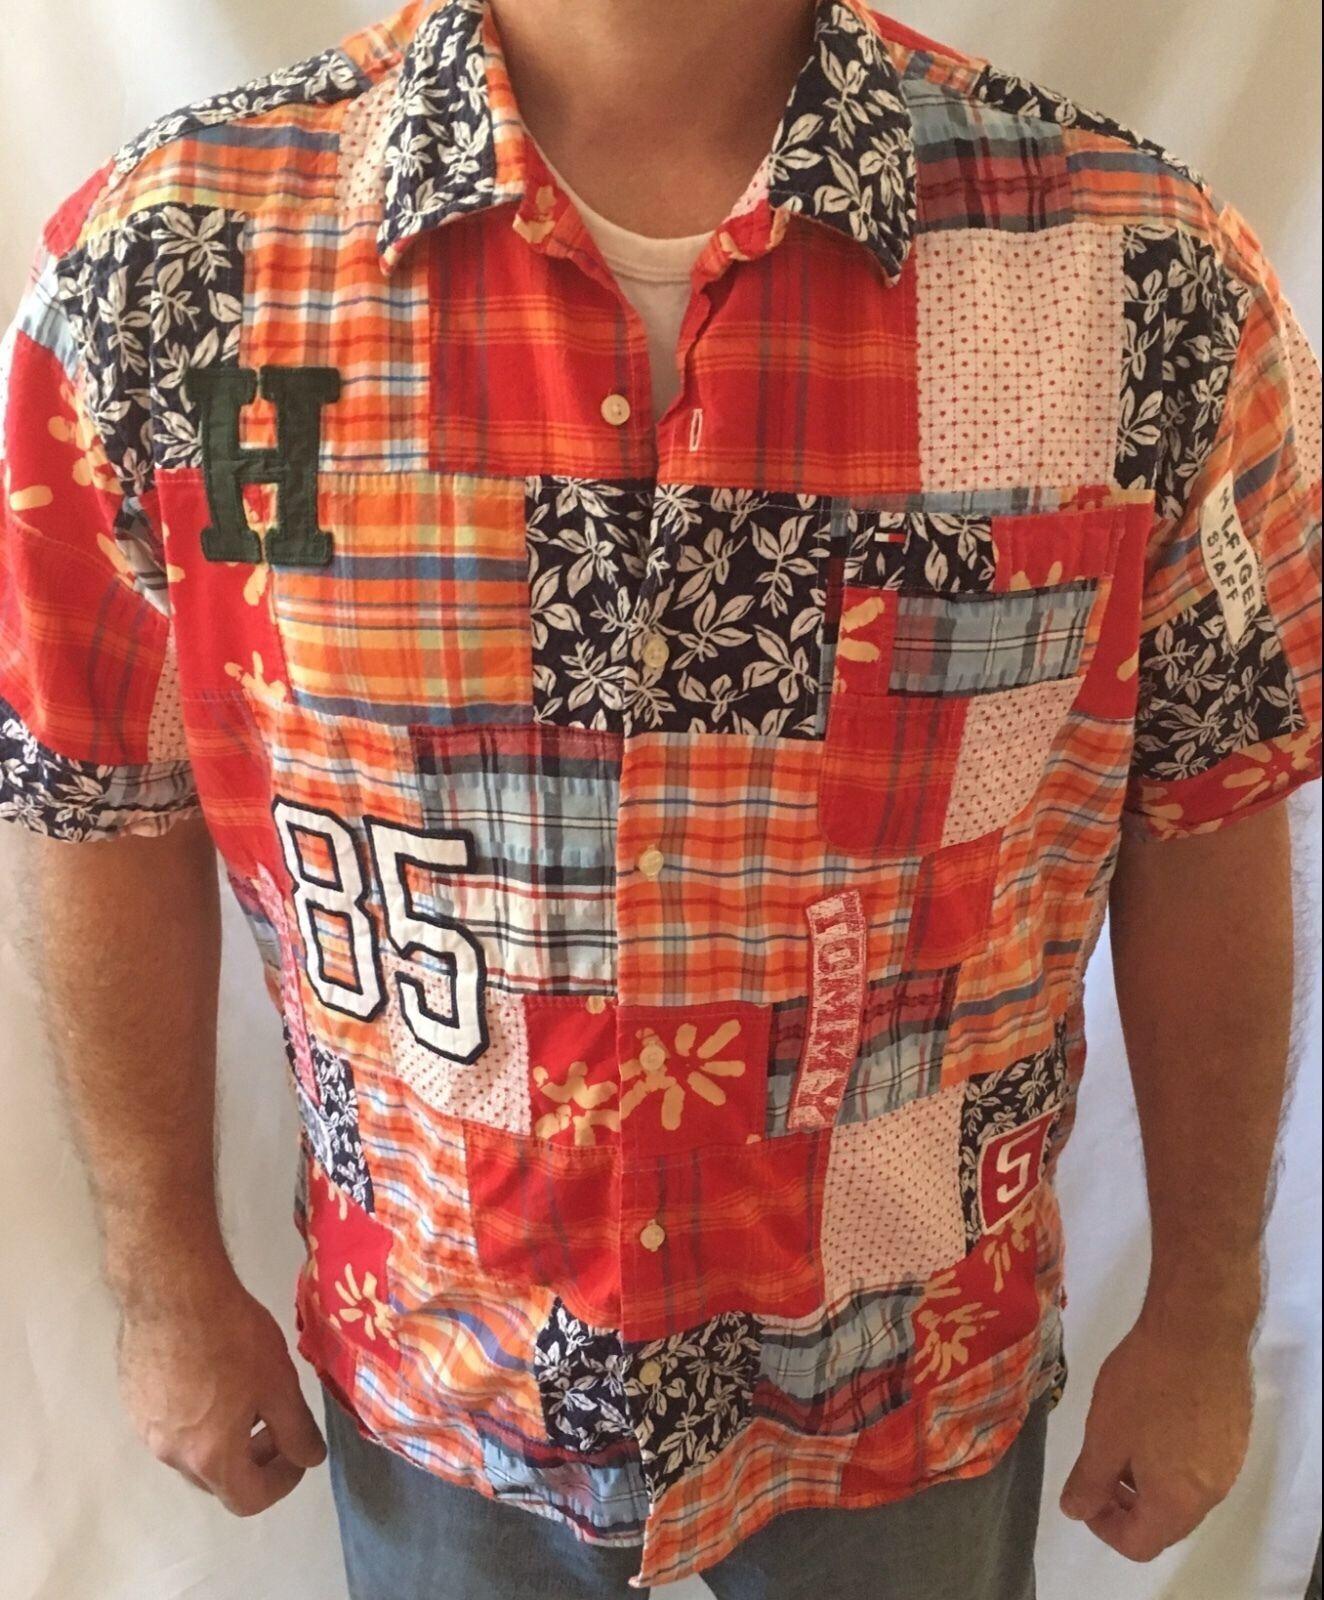 Rare TOMMY TOMMY Rare HILFIGER Uomo's 85 Hawaiian Shirt Short Sleeve Madras Size XL EUC c3efb2